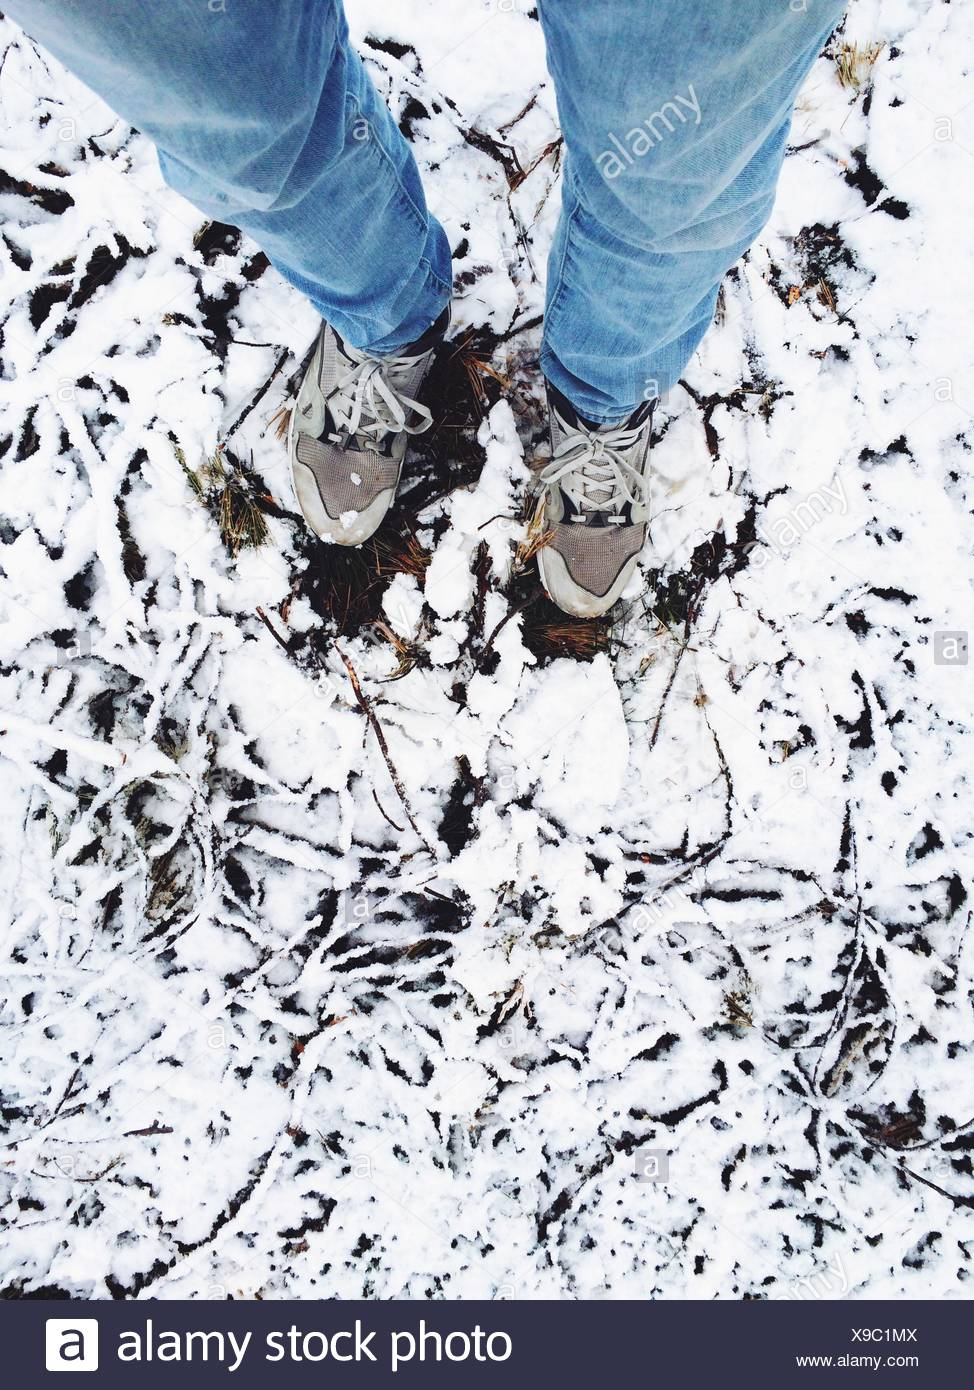 Human Feet - Stock Image